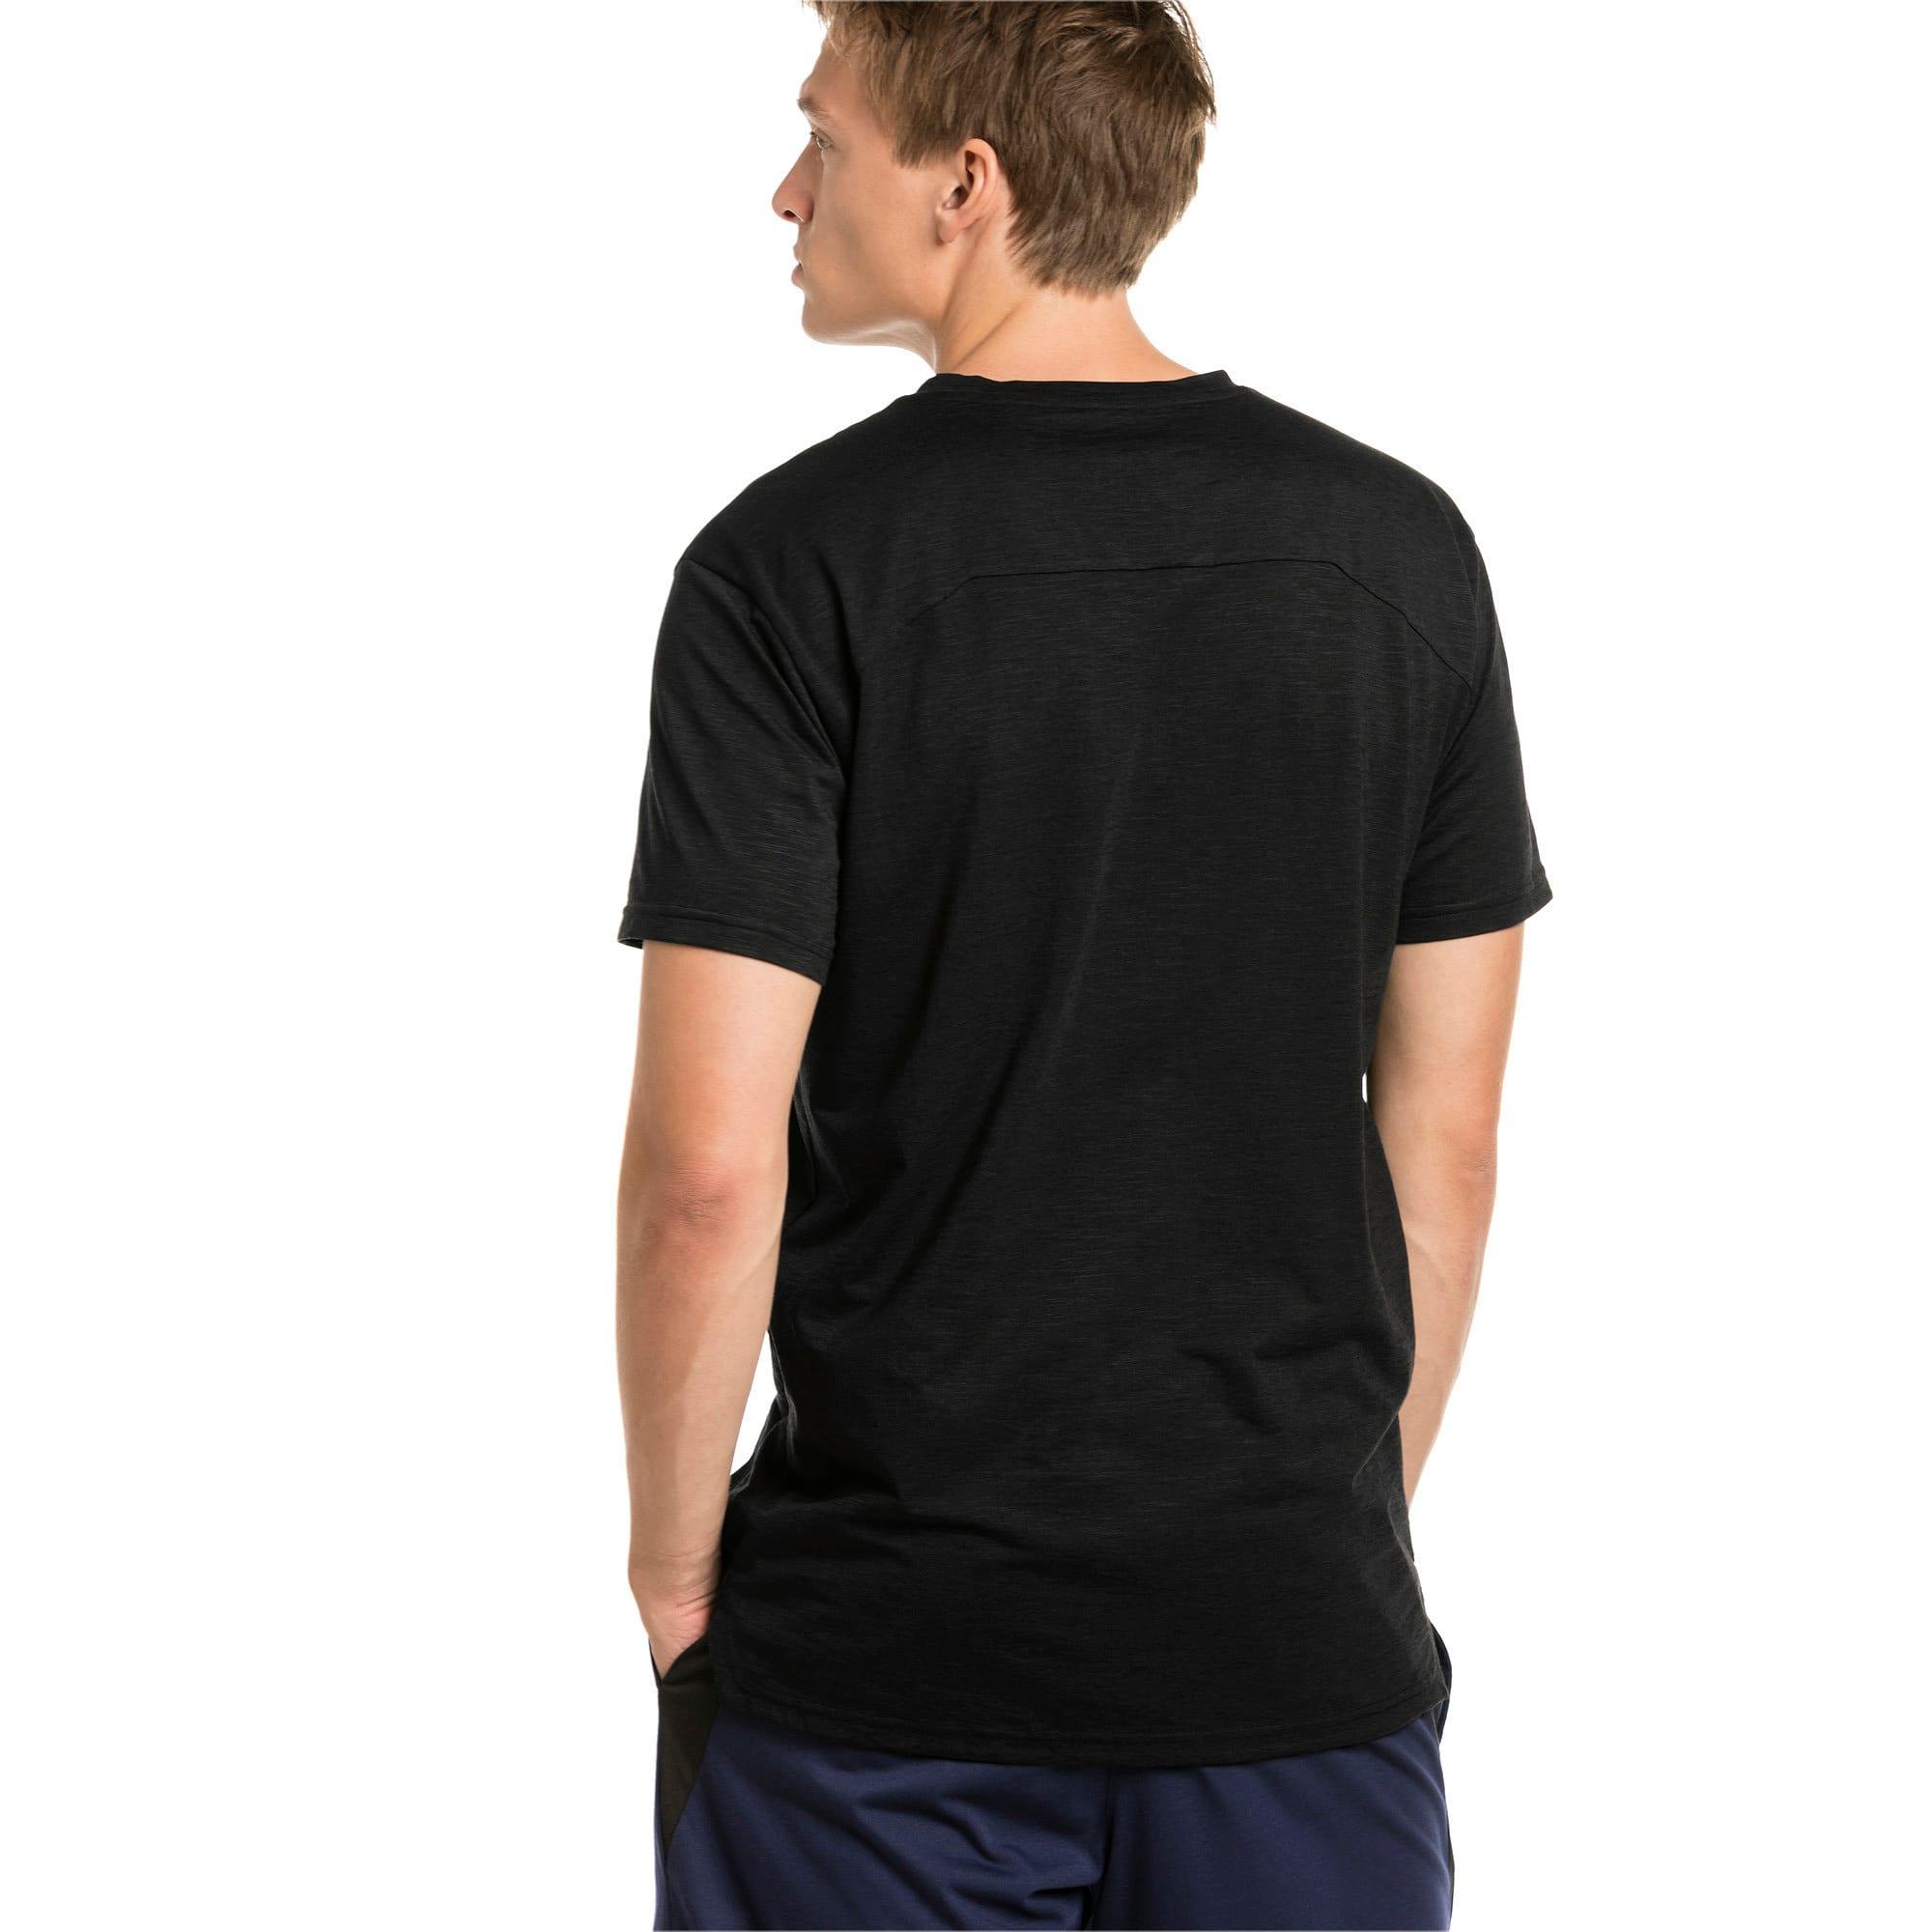 Thumbnail 2 of Energy Herren Training T-Shirt, Puma Black Heather, medium